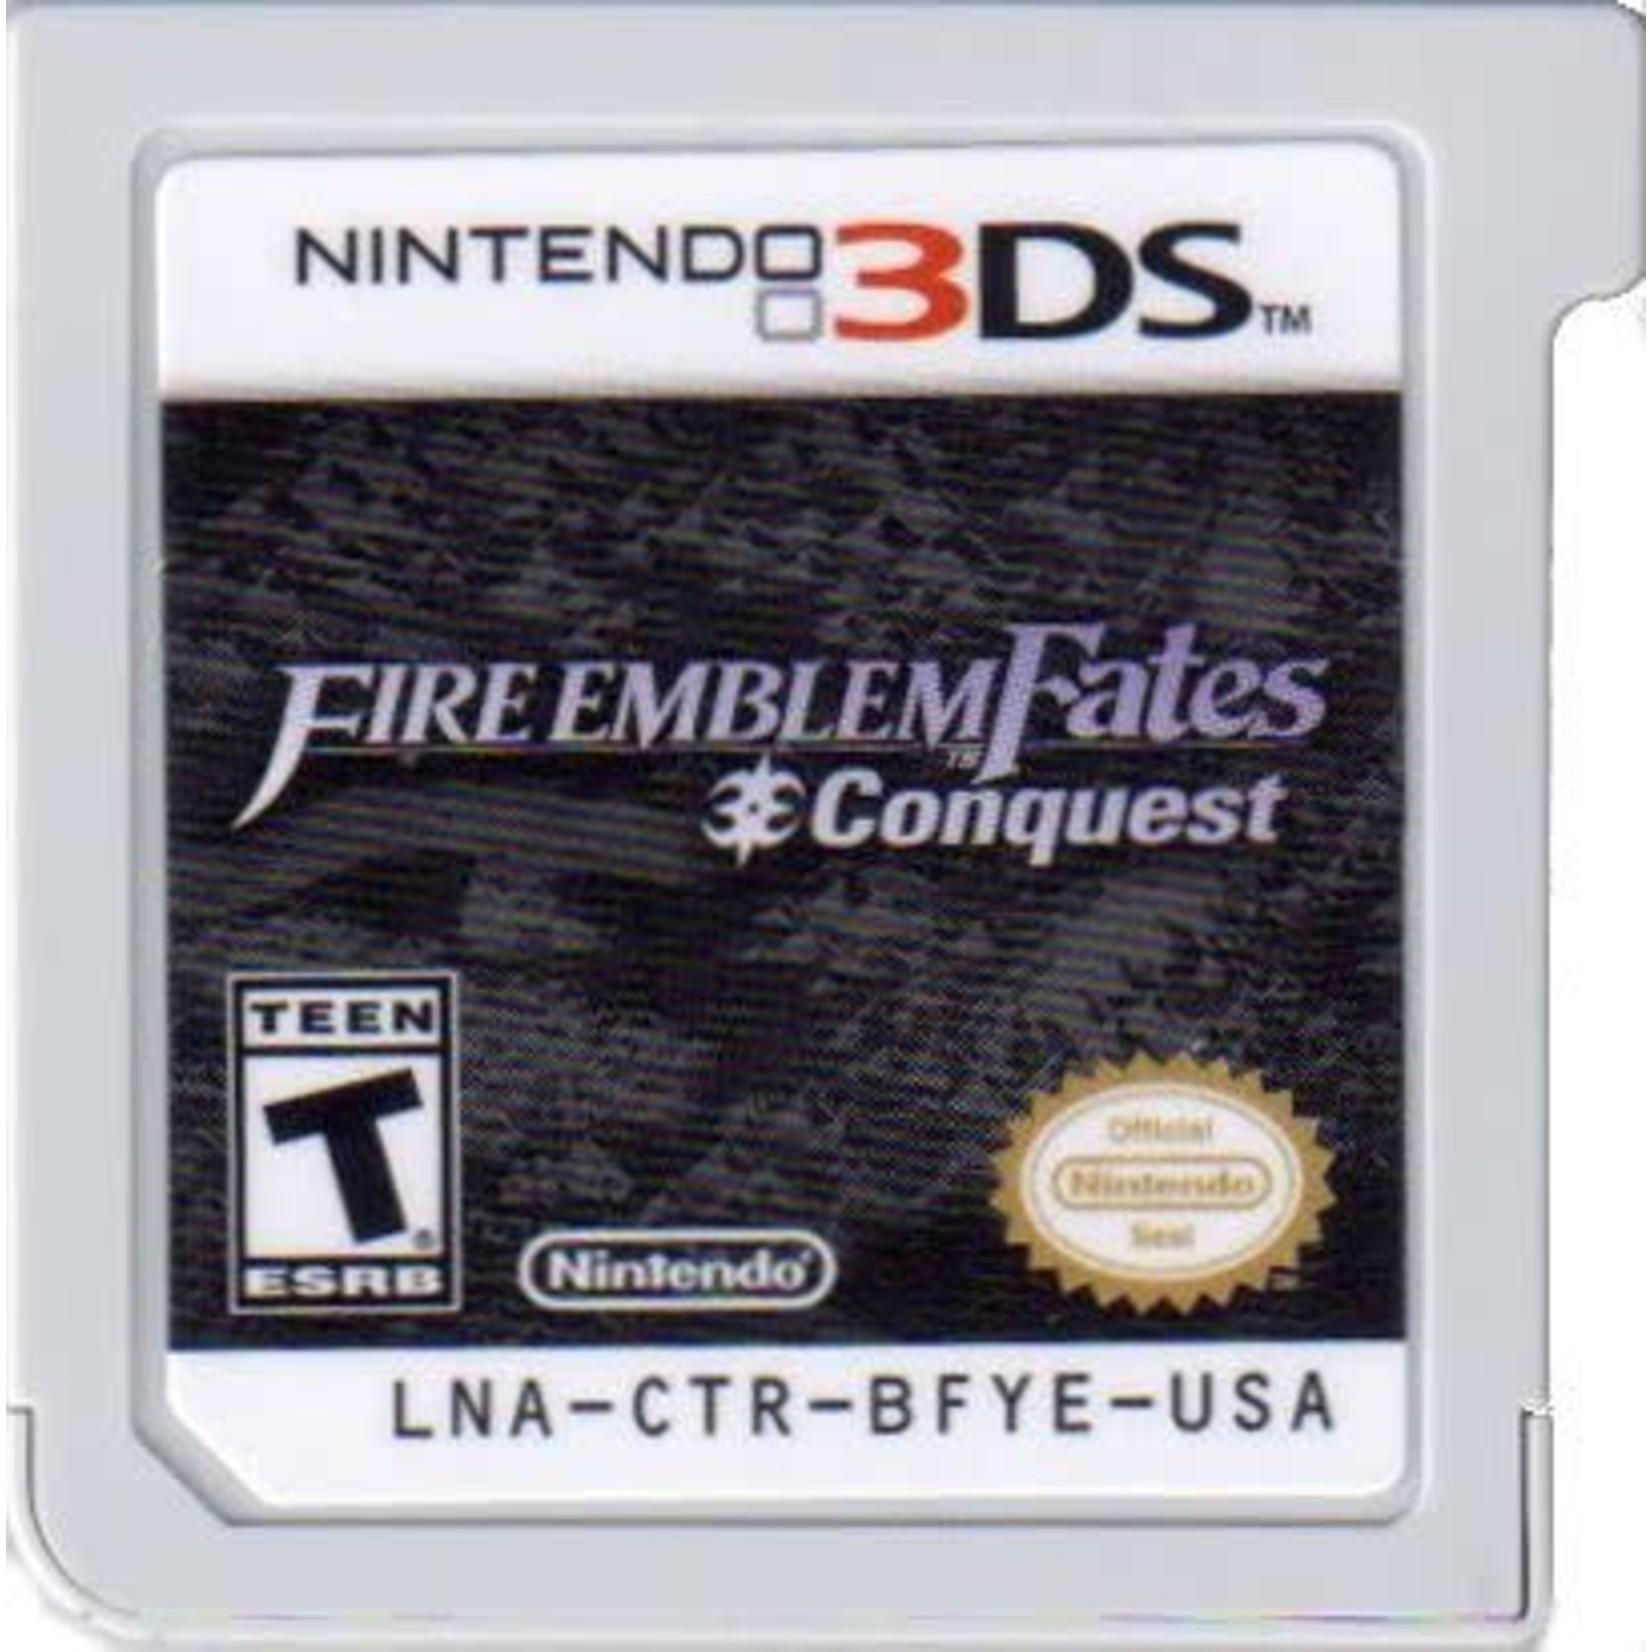 3DSU-Fire Emblem Fates Conquest (Chip Only)